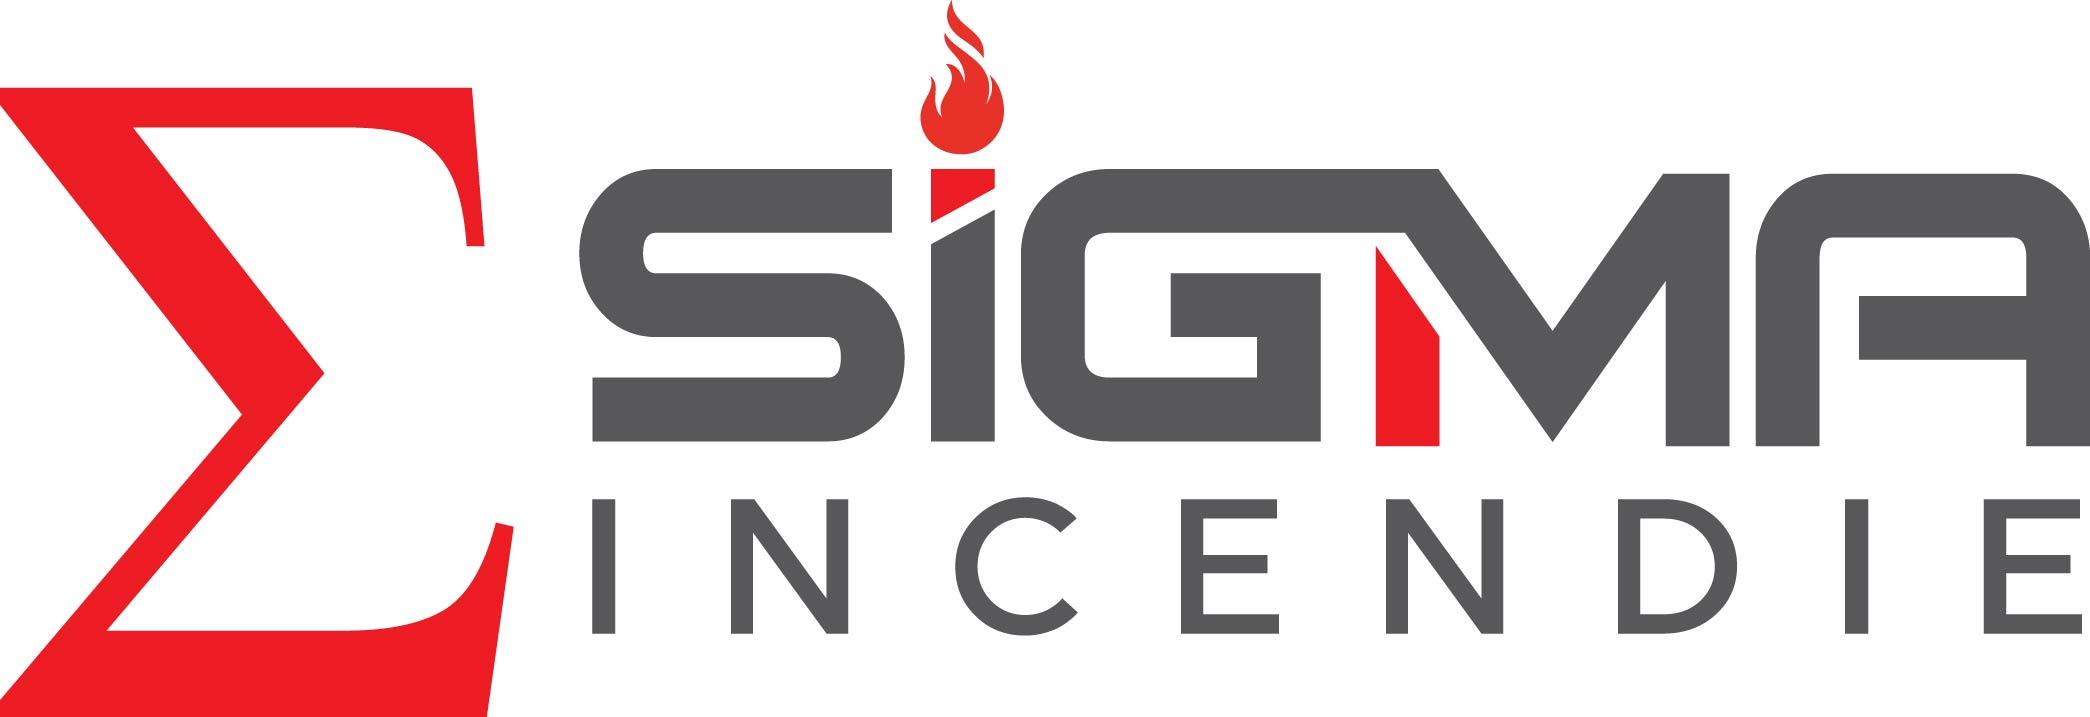 Sigma Incendie – Prévention Incendie & Coordinateur SSI